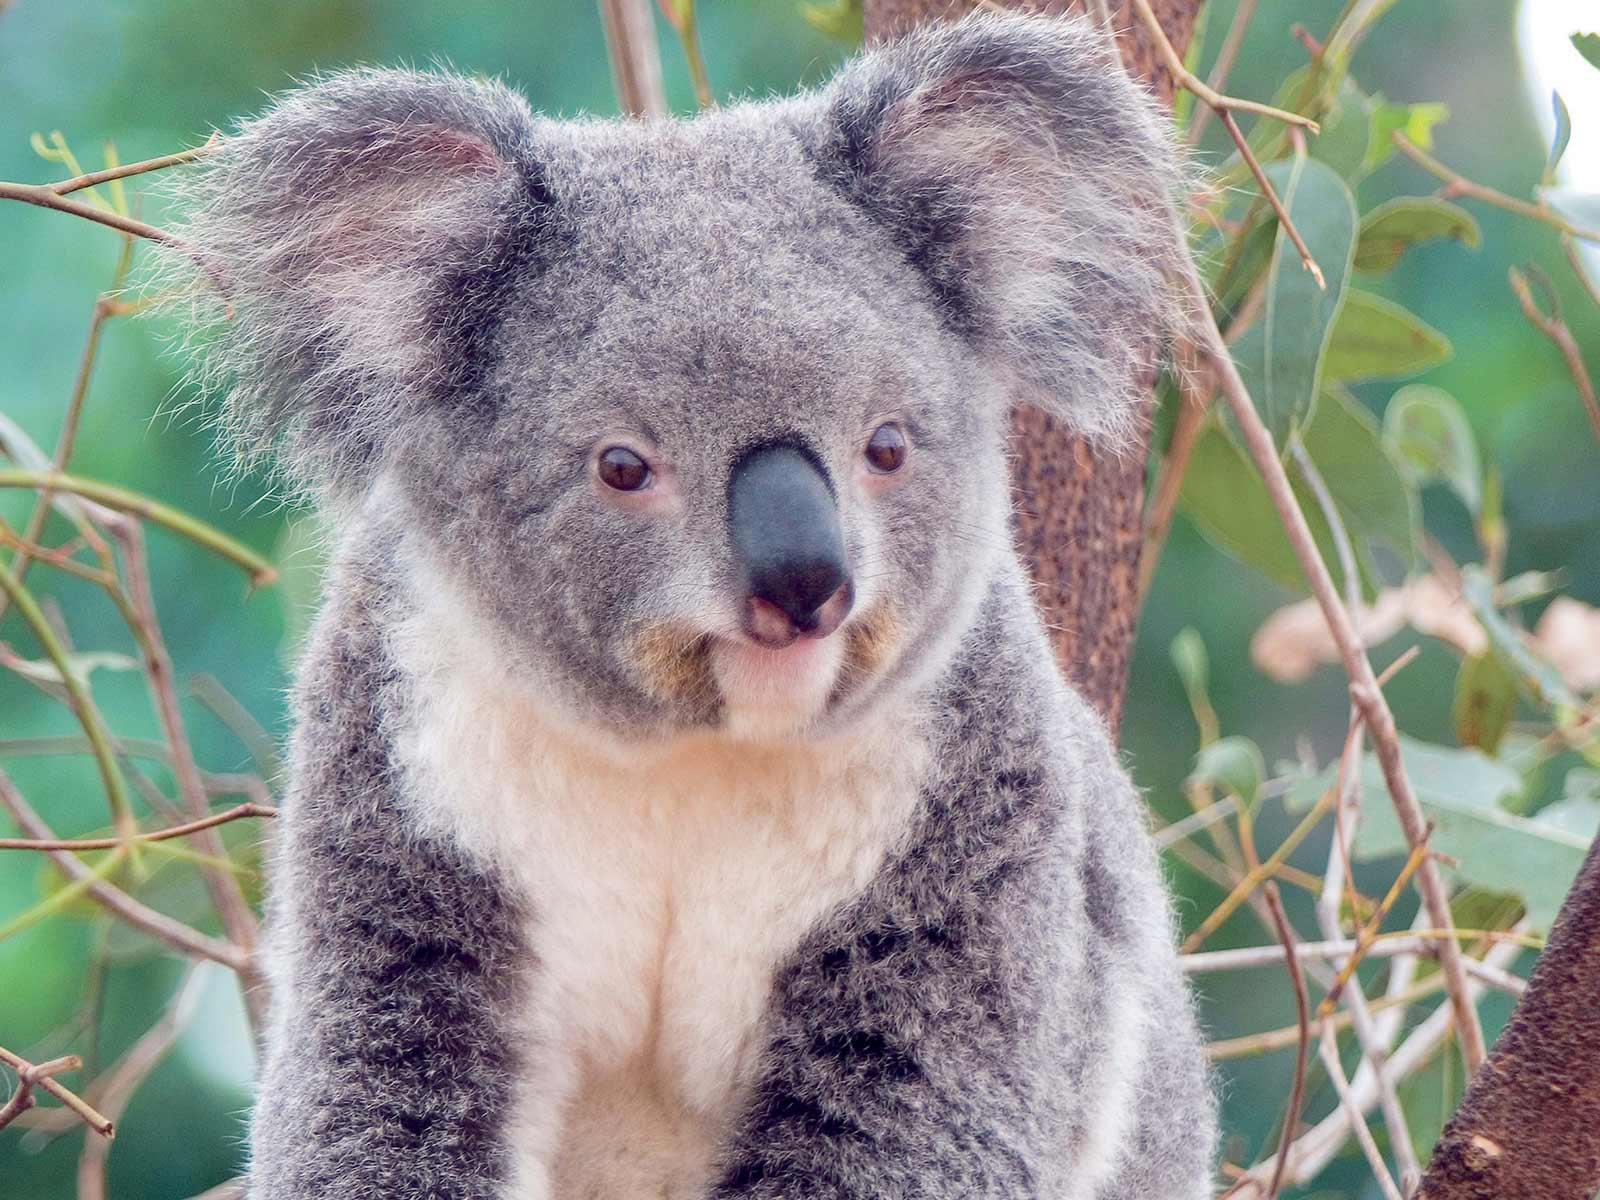 Kali Wallpaper Cute Koala Bear HD Wallpapers 1600x1200